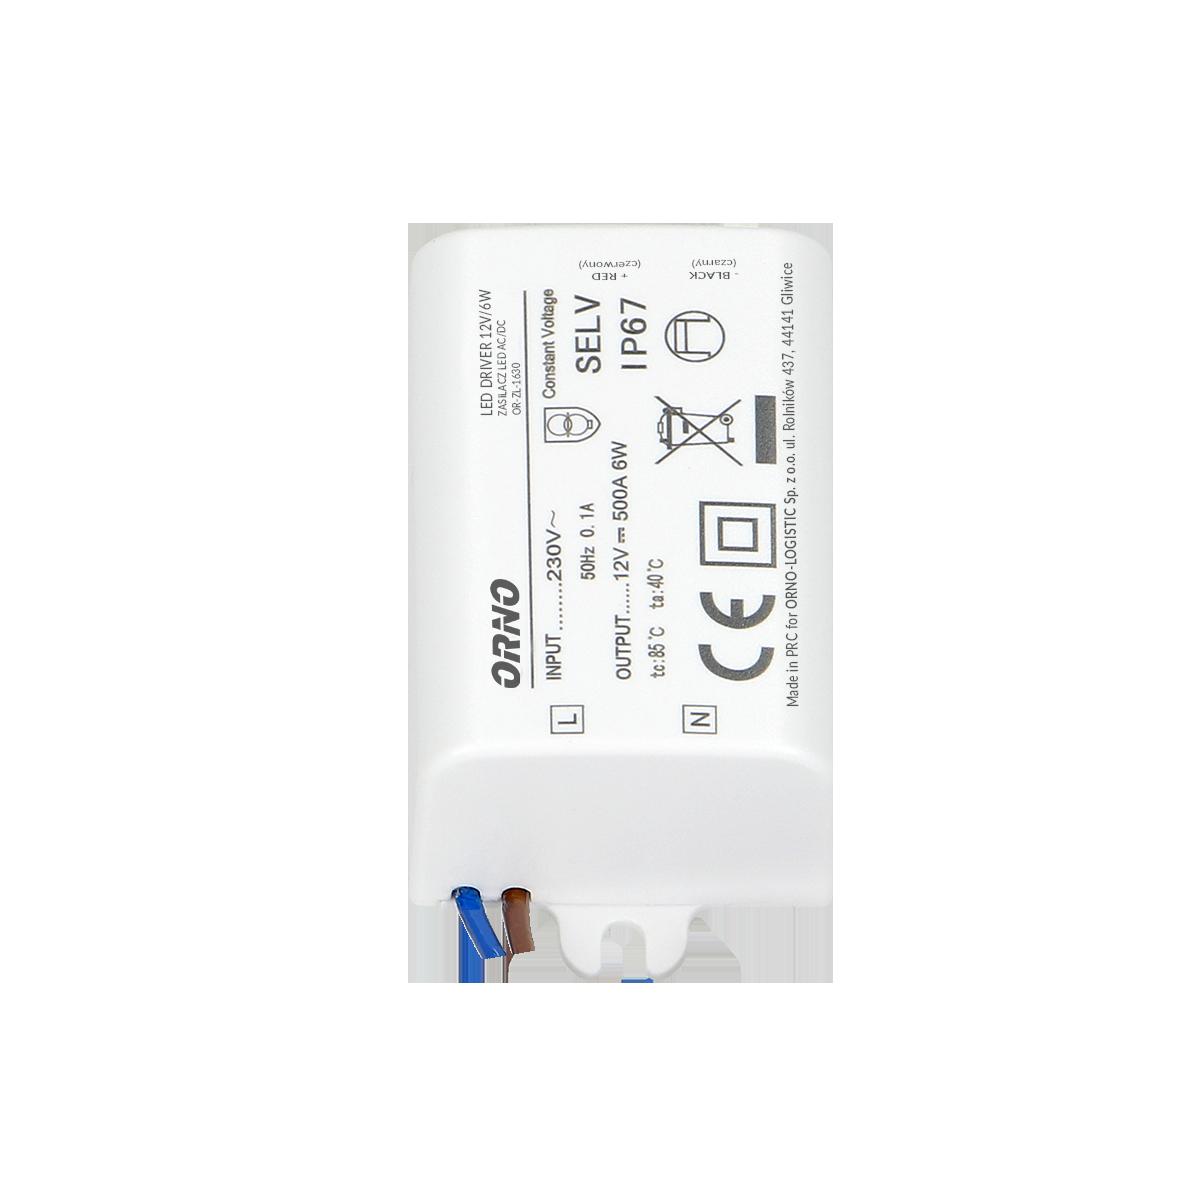 Zasilacz MINI do LED do puszki 12VDC 6W, IP67, 55/29,5/22mm